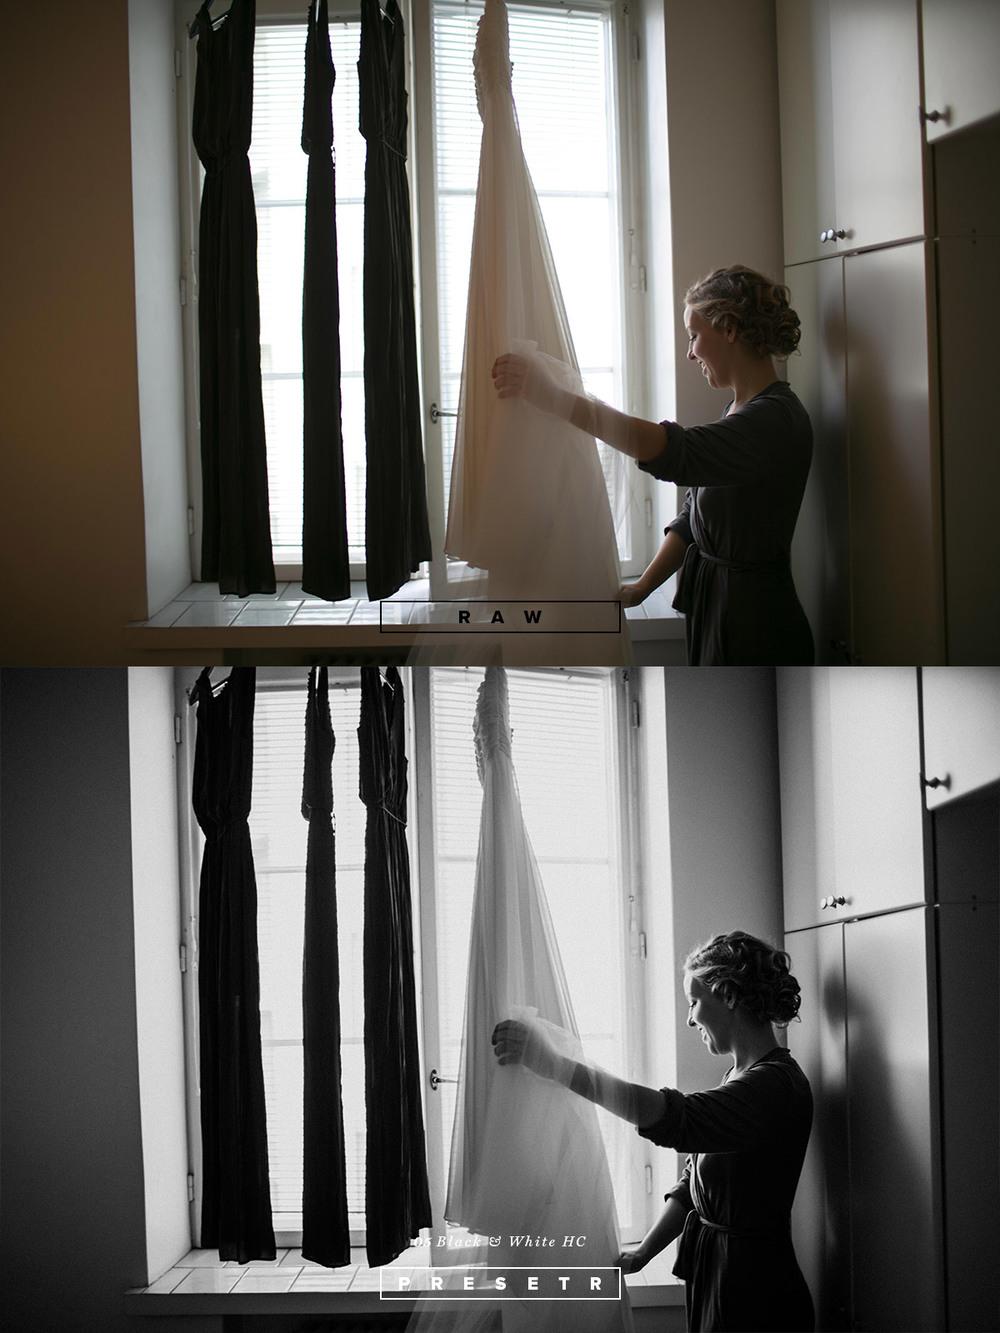 presetr_infra_lightroom_preset_2.jpg